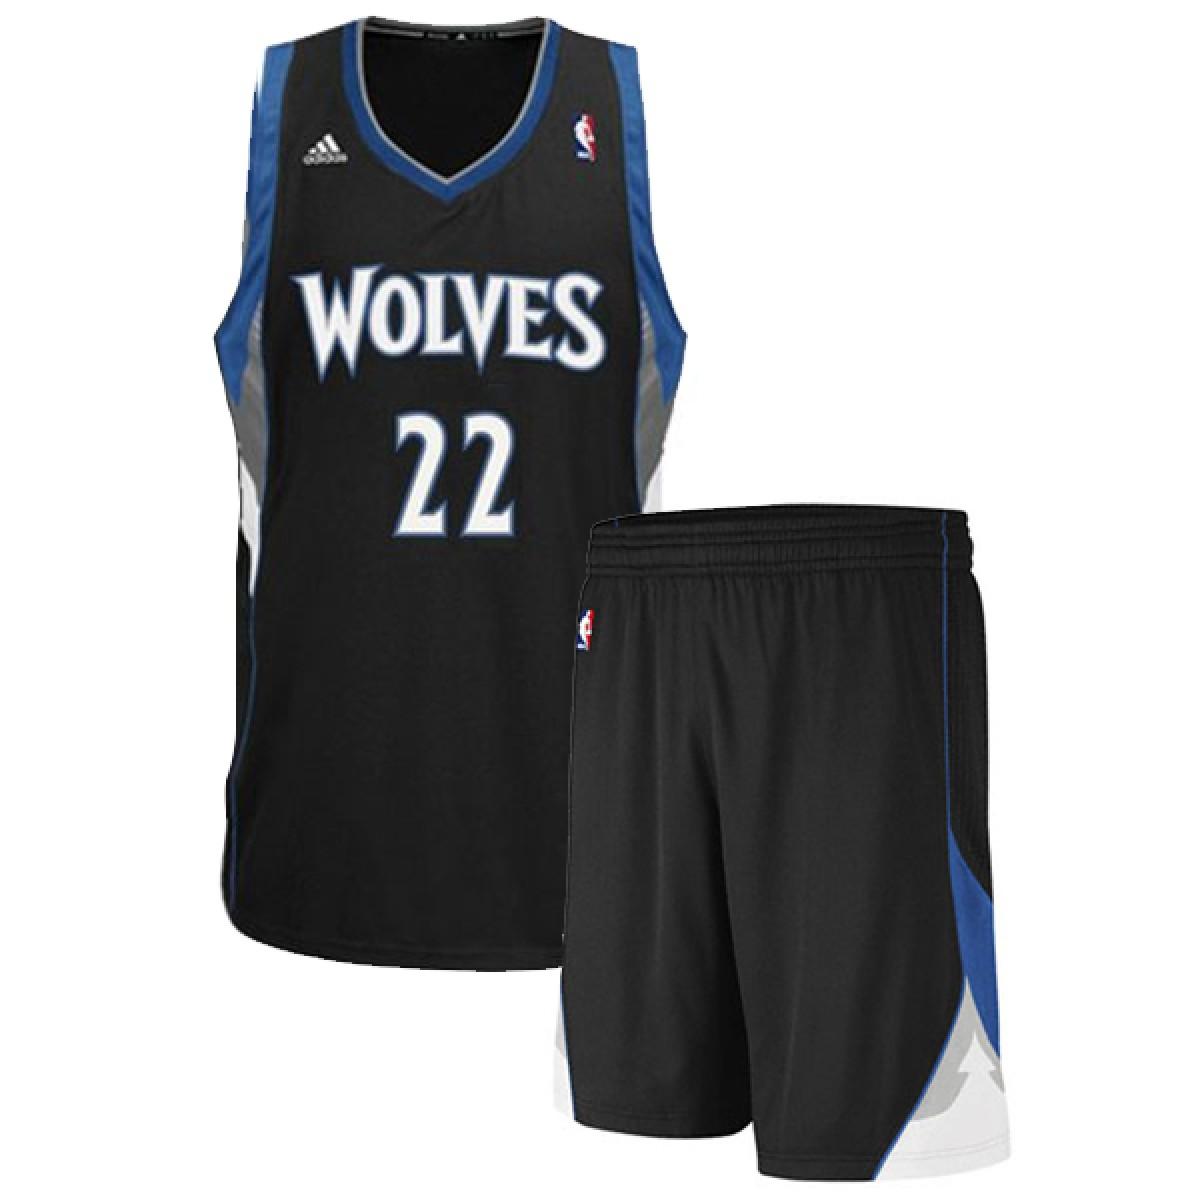 ADIDAS NBA Conjunto Minesota Timberwolves 'Andrew Wiggins' Away